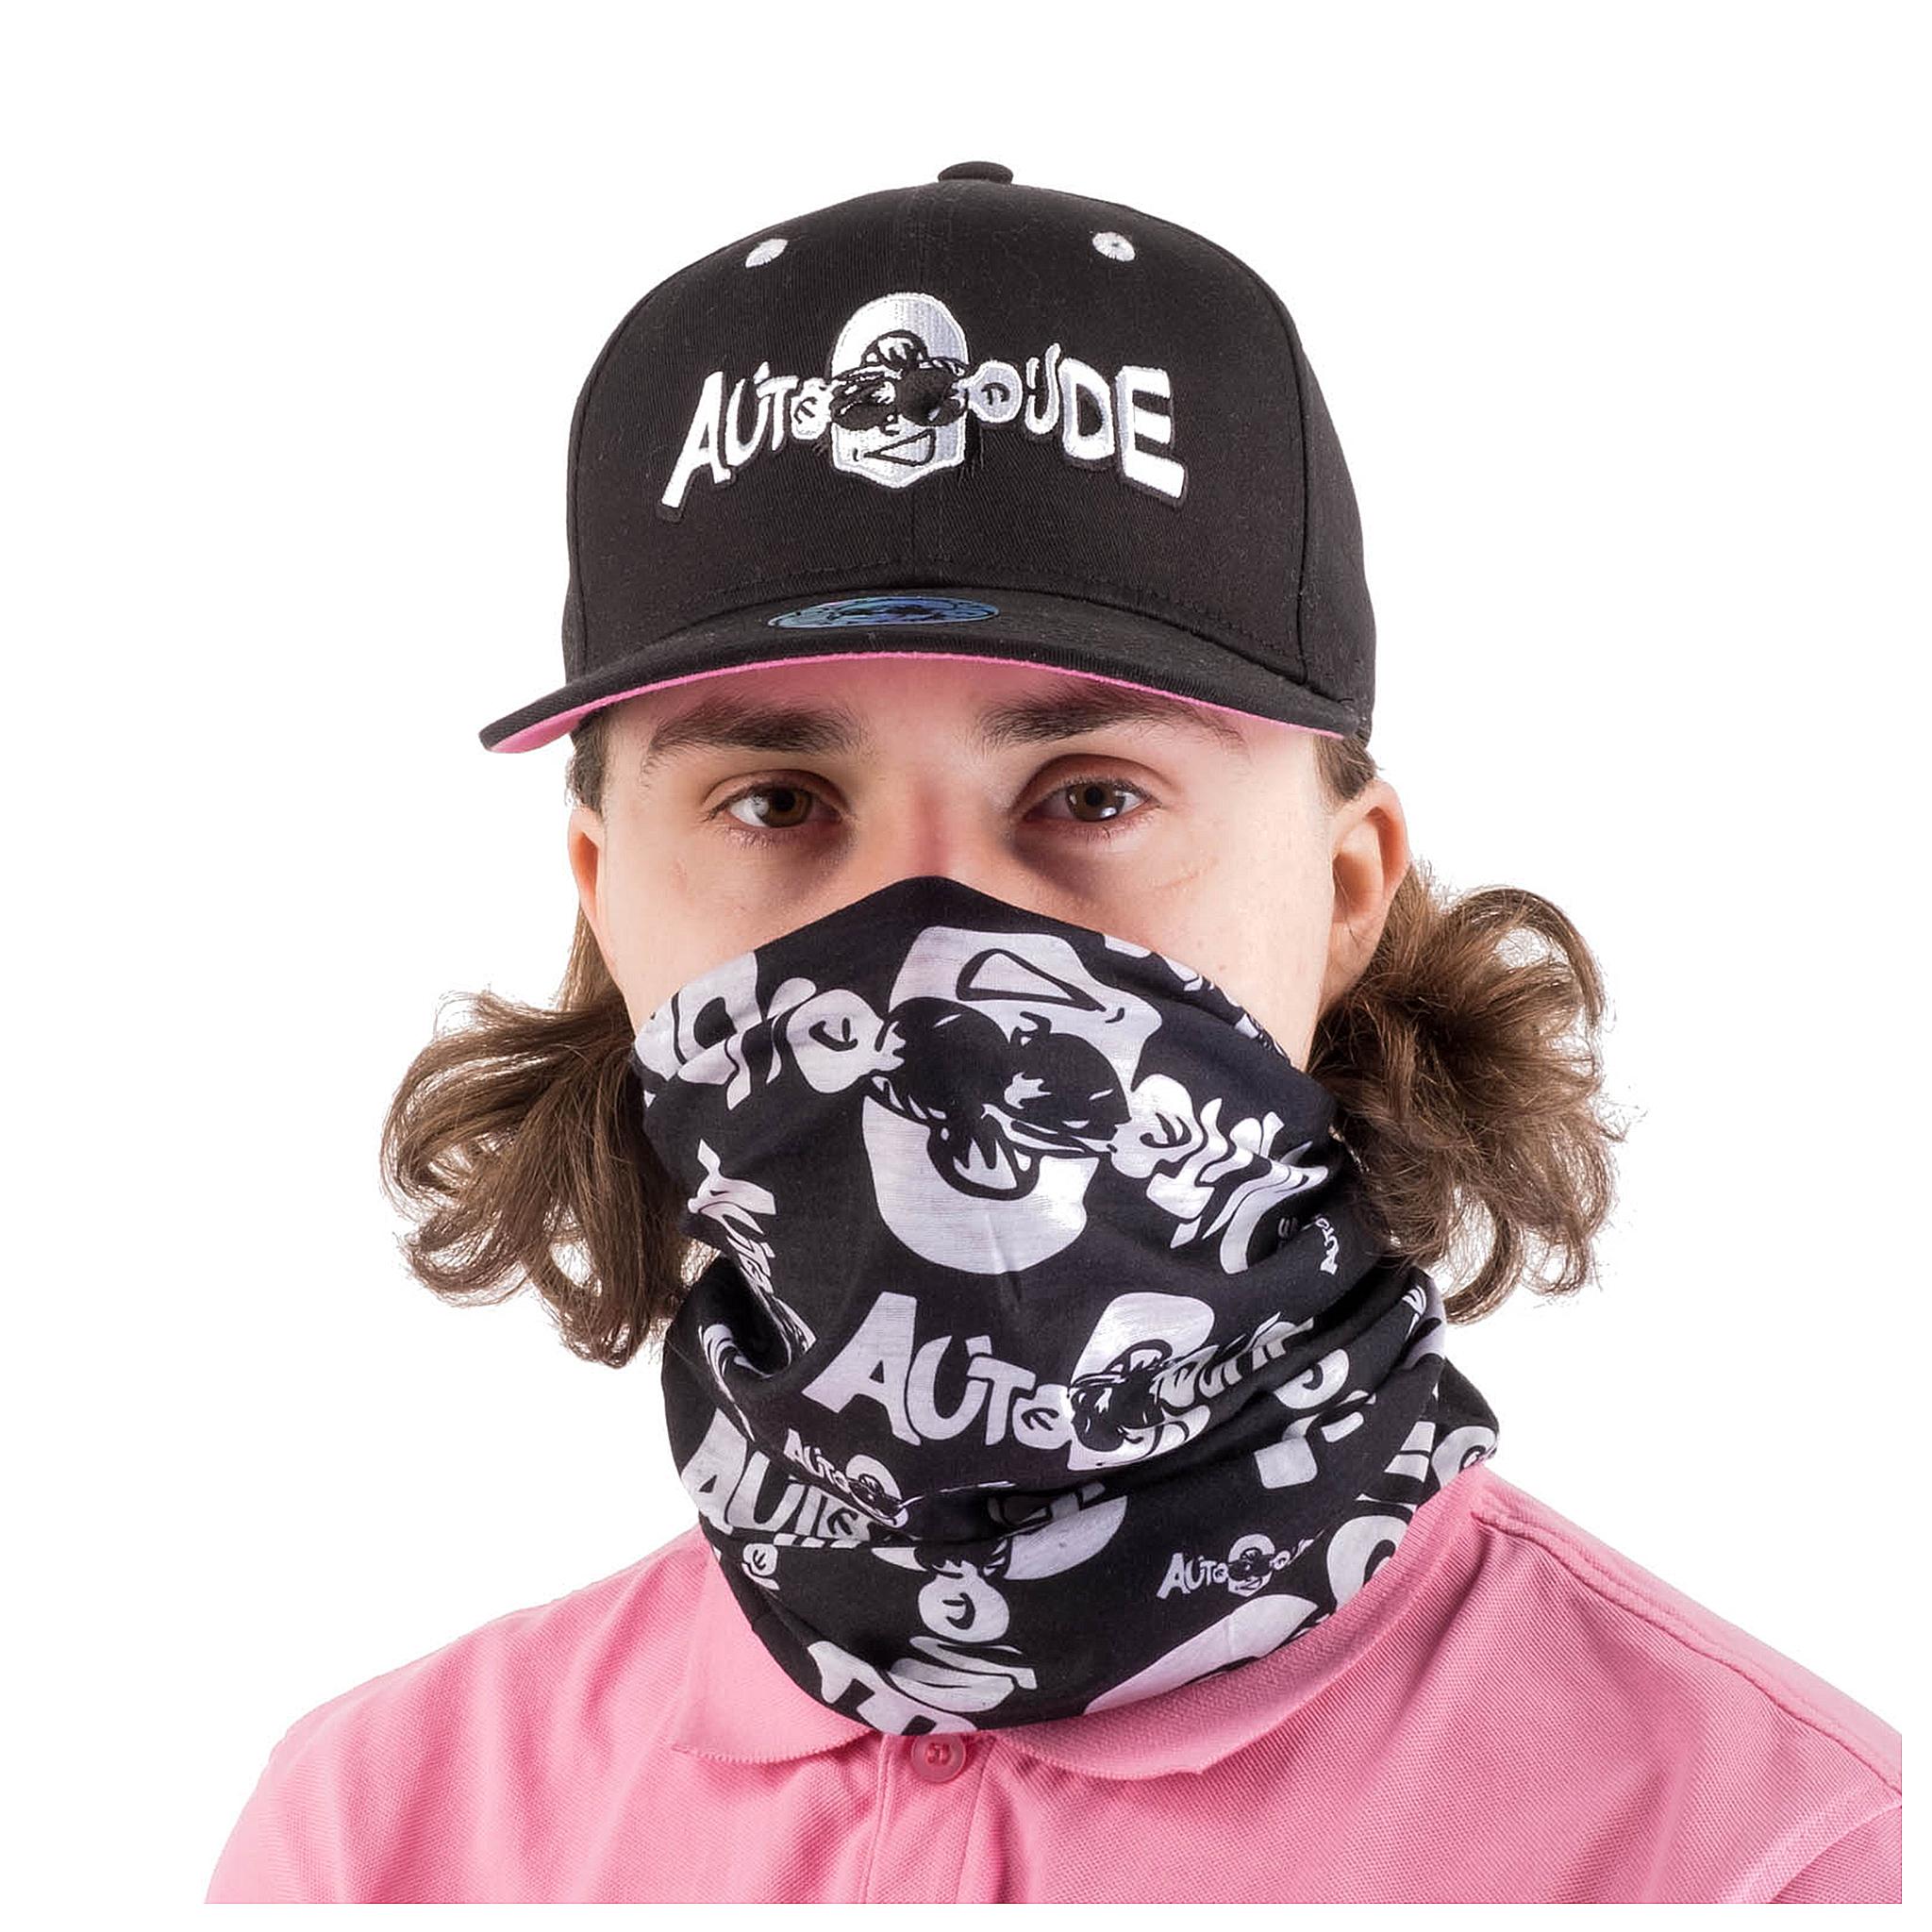 AUTODUDE Tube / Headwear - GRATIS vid order över 500 kr